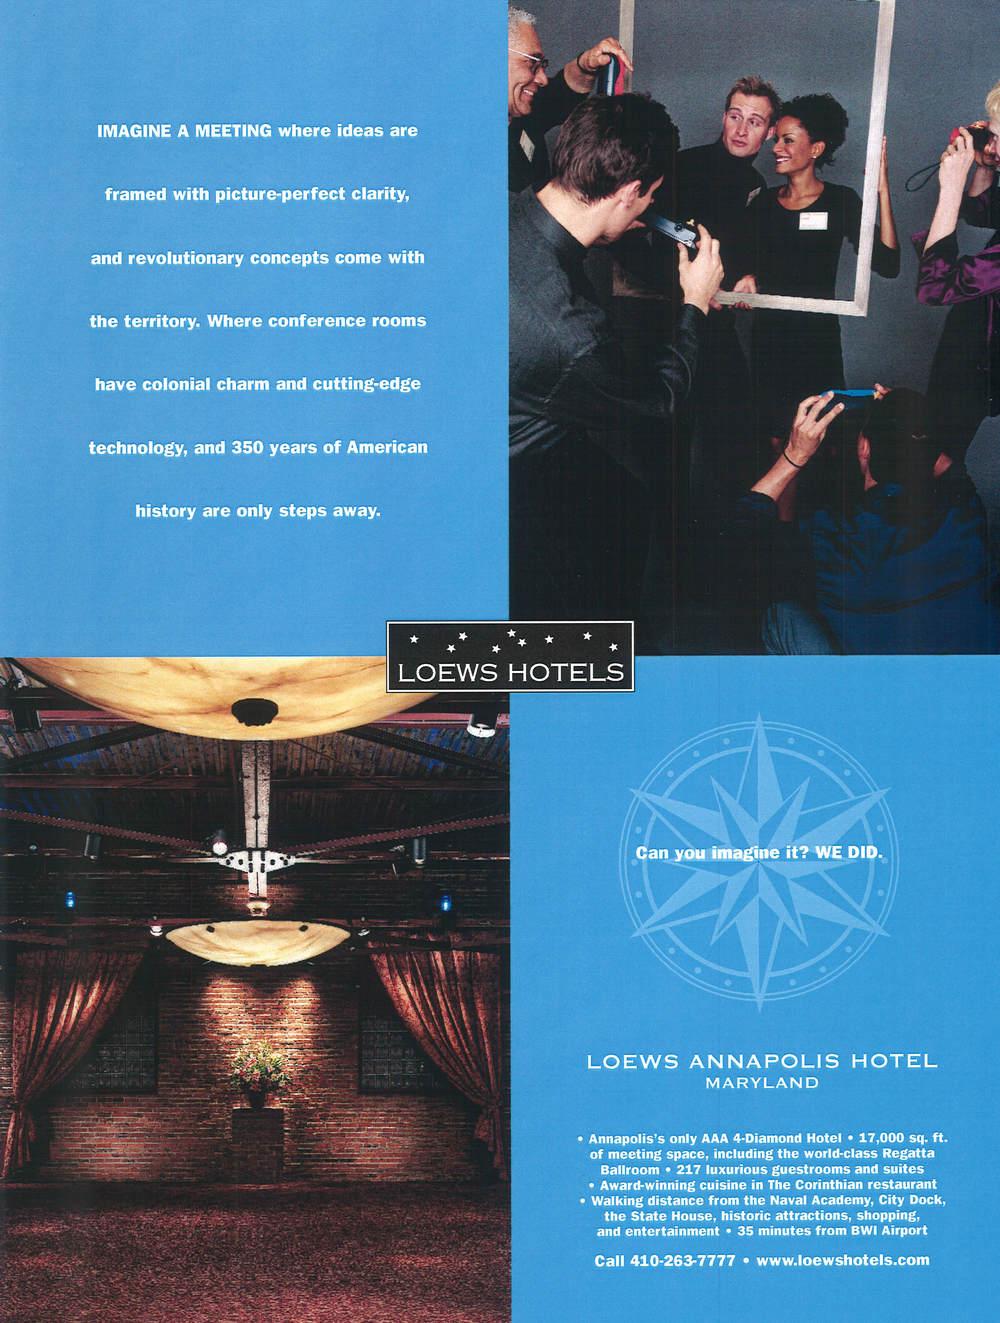 Loews Hotels print ad 2.jpg